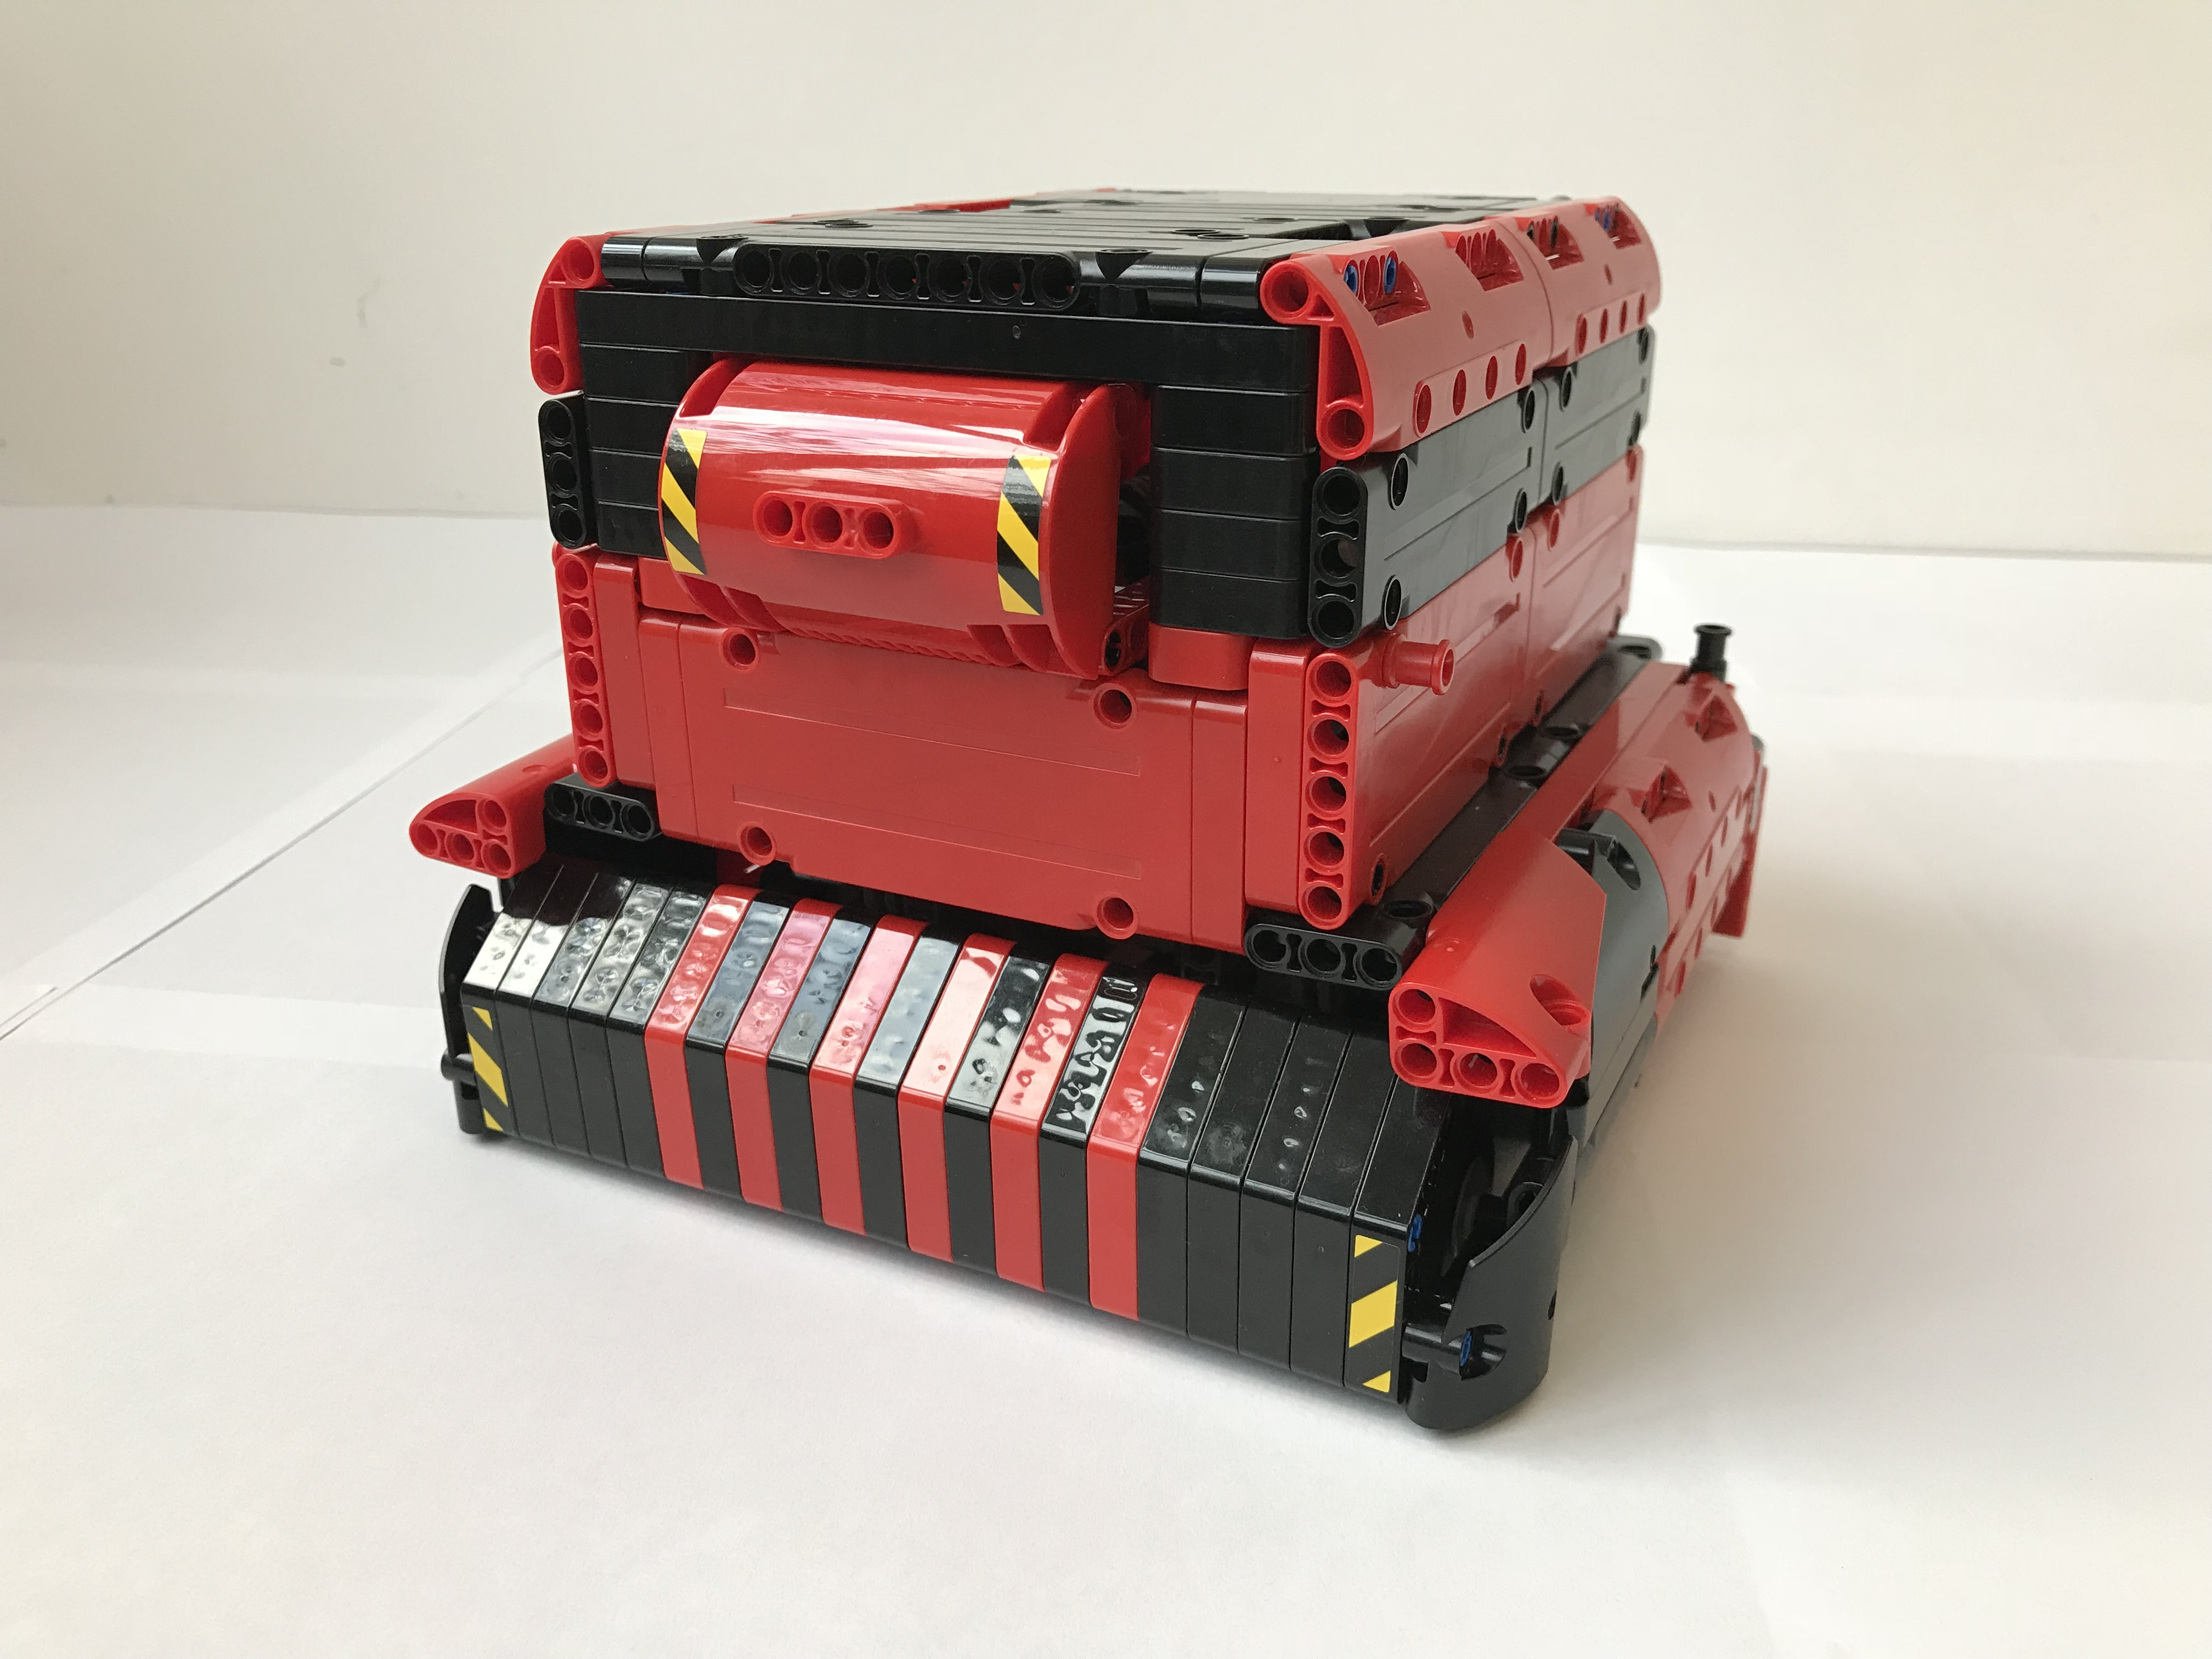 Redbot by Homersapien